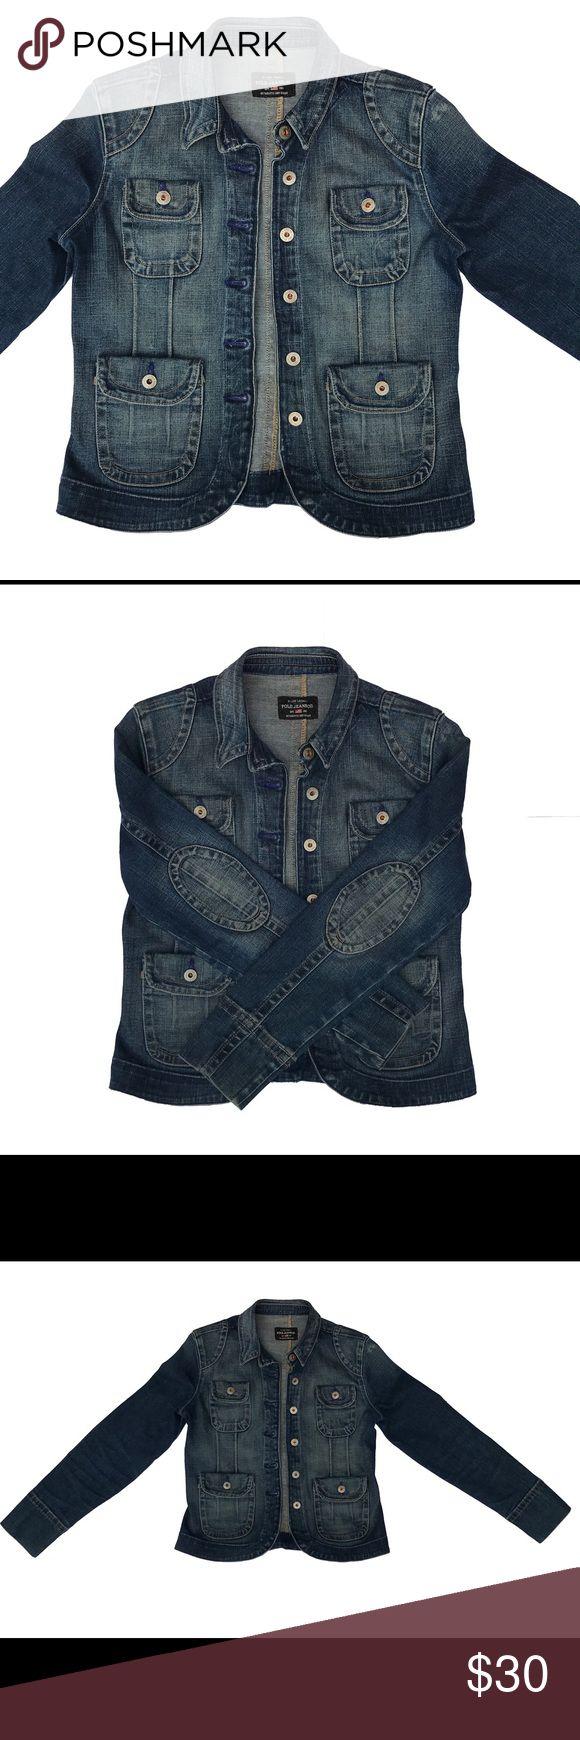 Ralph Lauren Polo Jeans Women's Jean Jacket Ralph Lauren Polo Jeans Women's Jean Jacket in a medium.The jacket is in great shape.Thank you for looking!! Ralph Lauren Polo Jeans  Jackets & Coats Jean Jackets